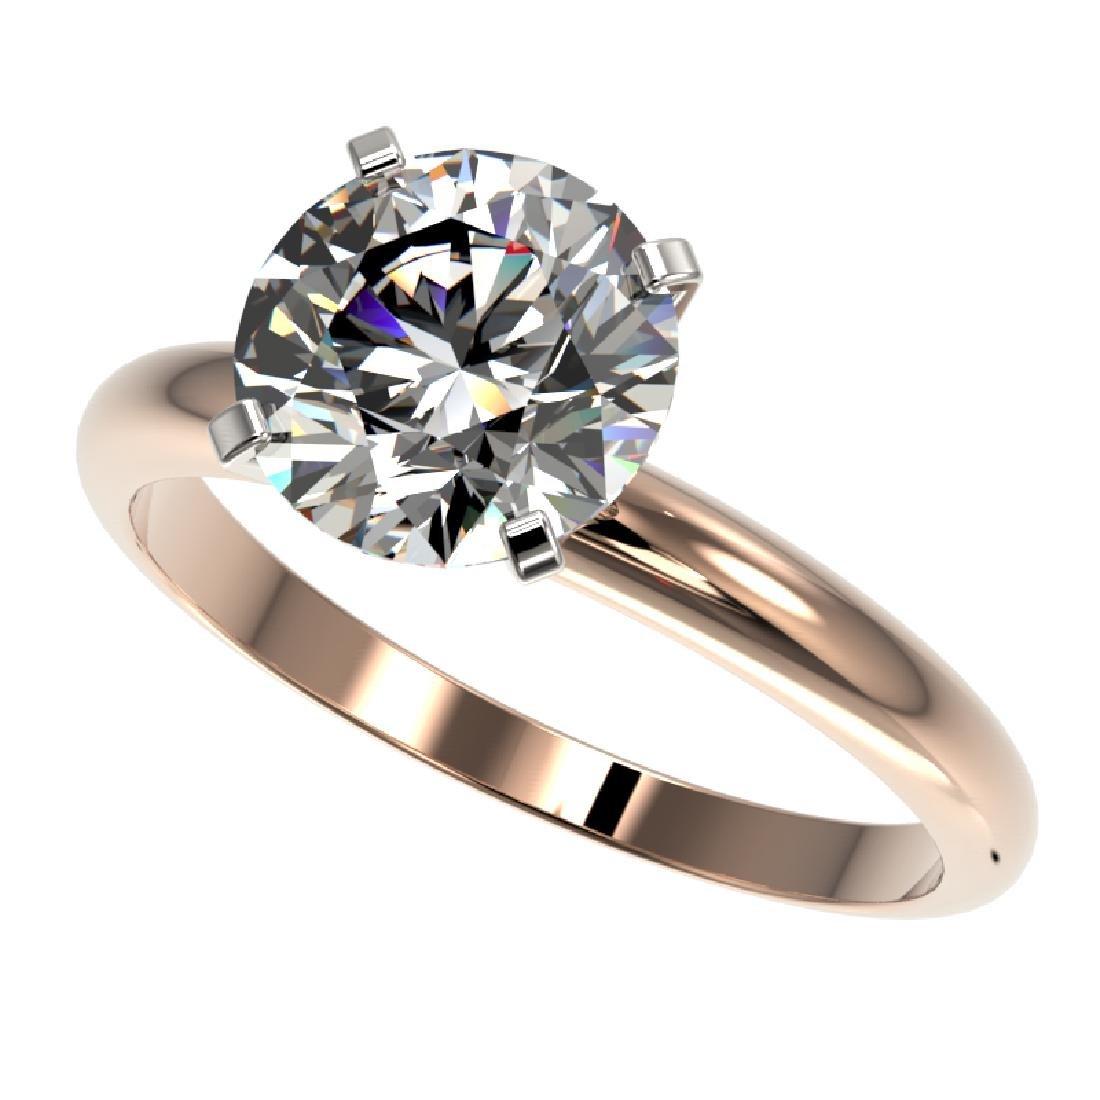 2.50 CTW Certified G-SI Diamond Engagement Ring 10K